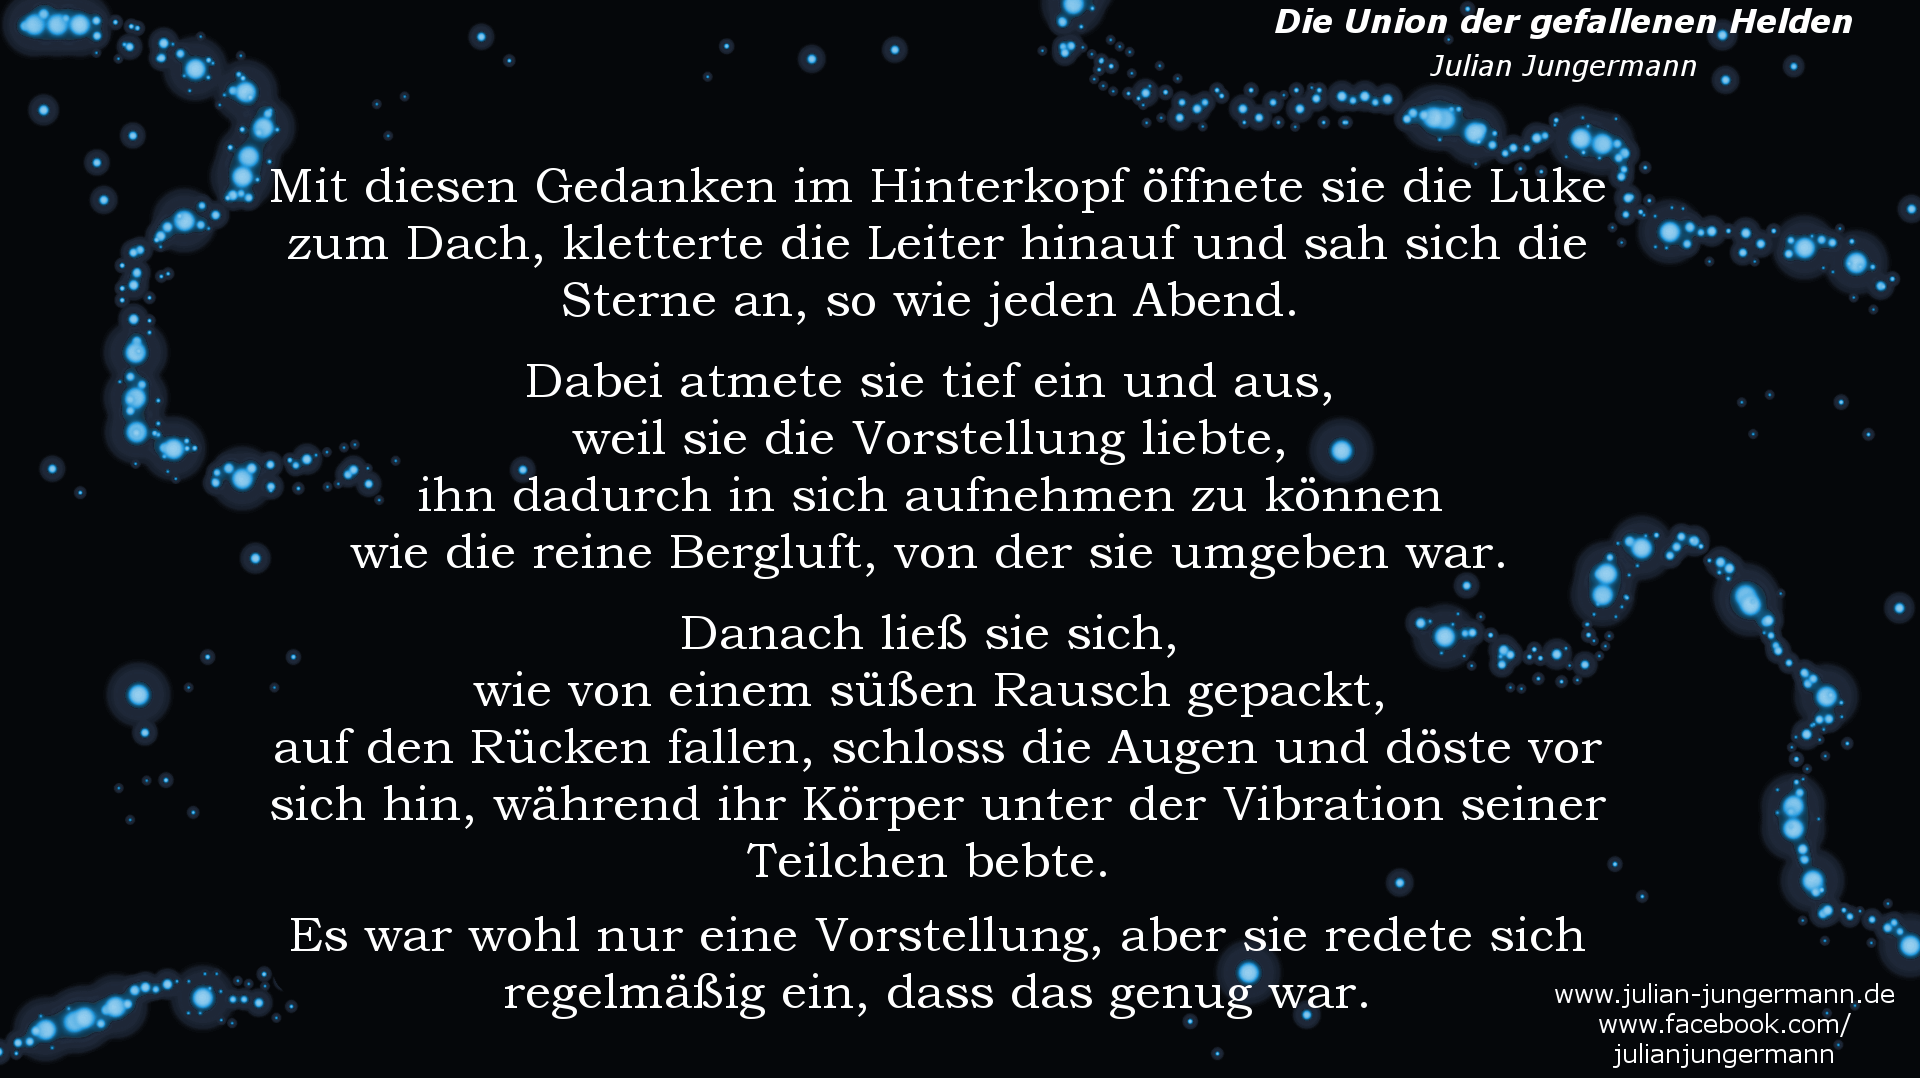 Bildpromo_SüßerRausch_ice